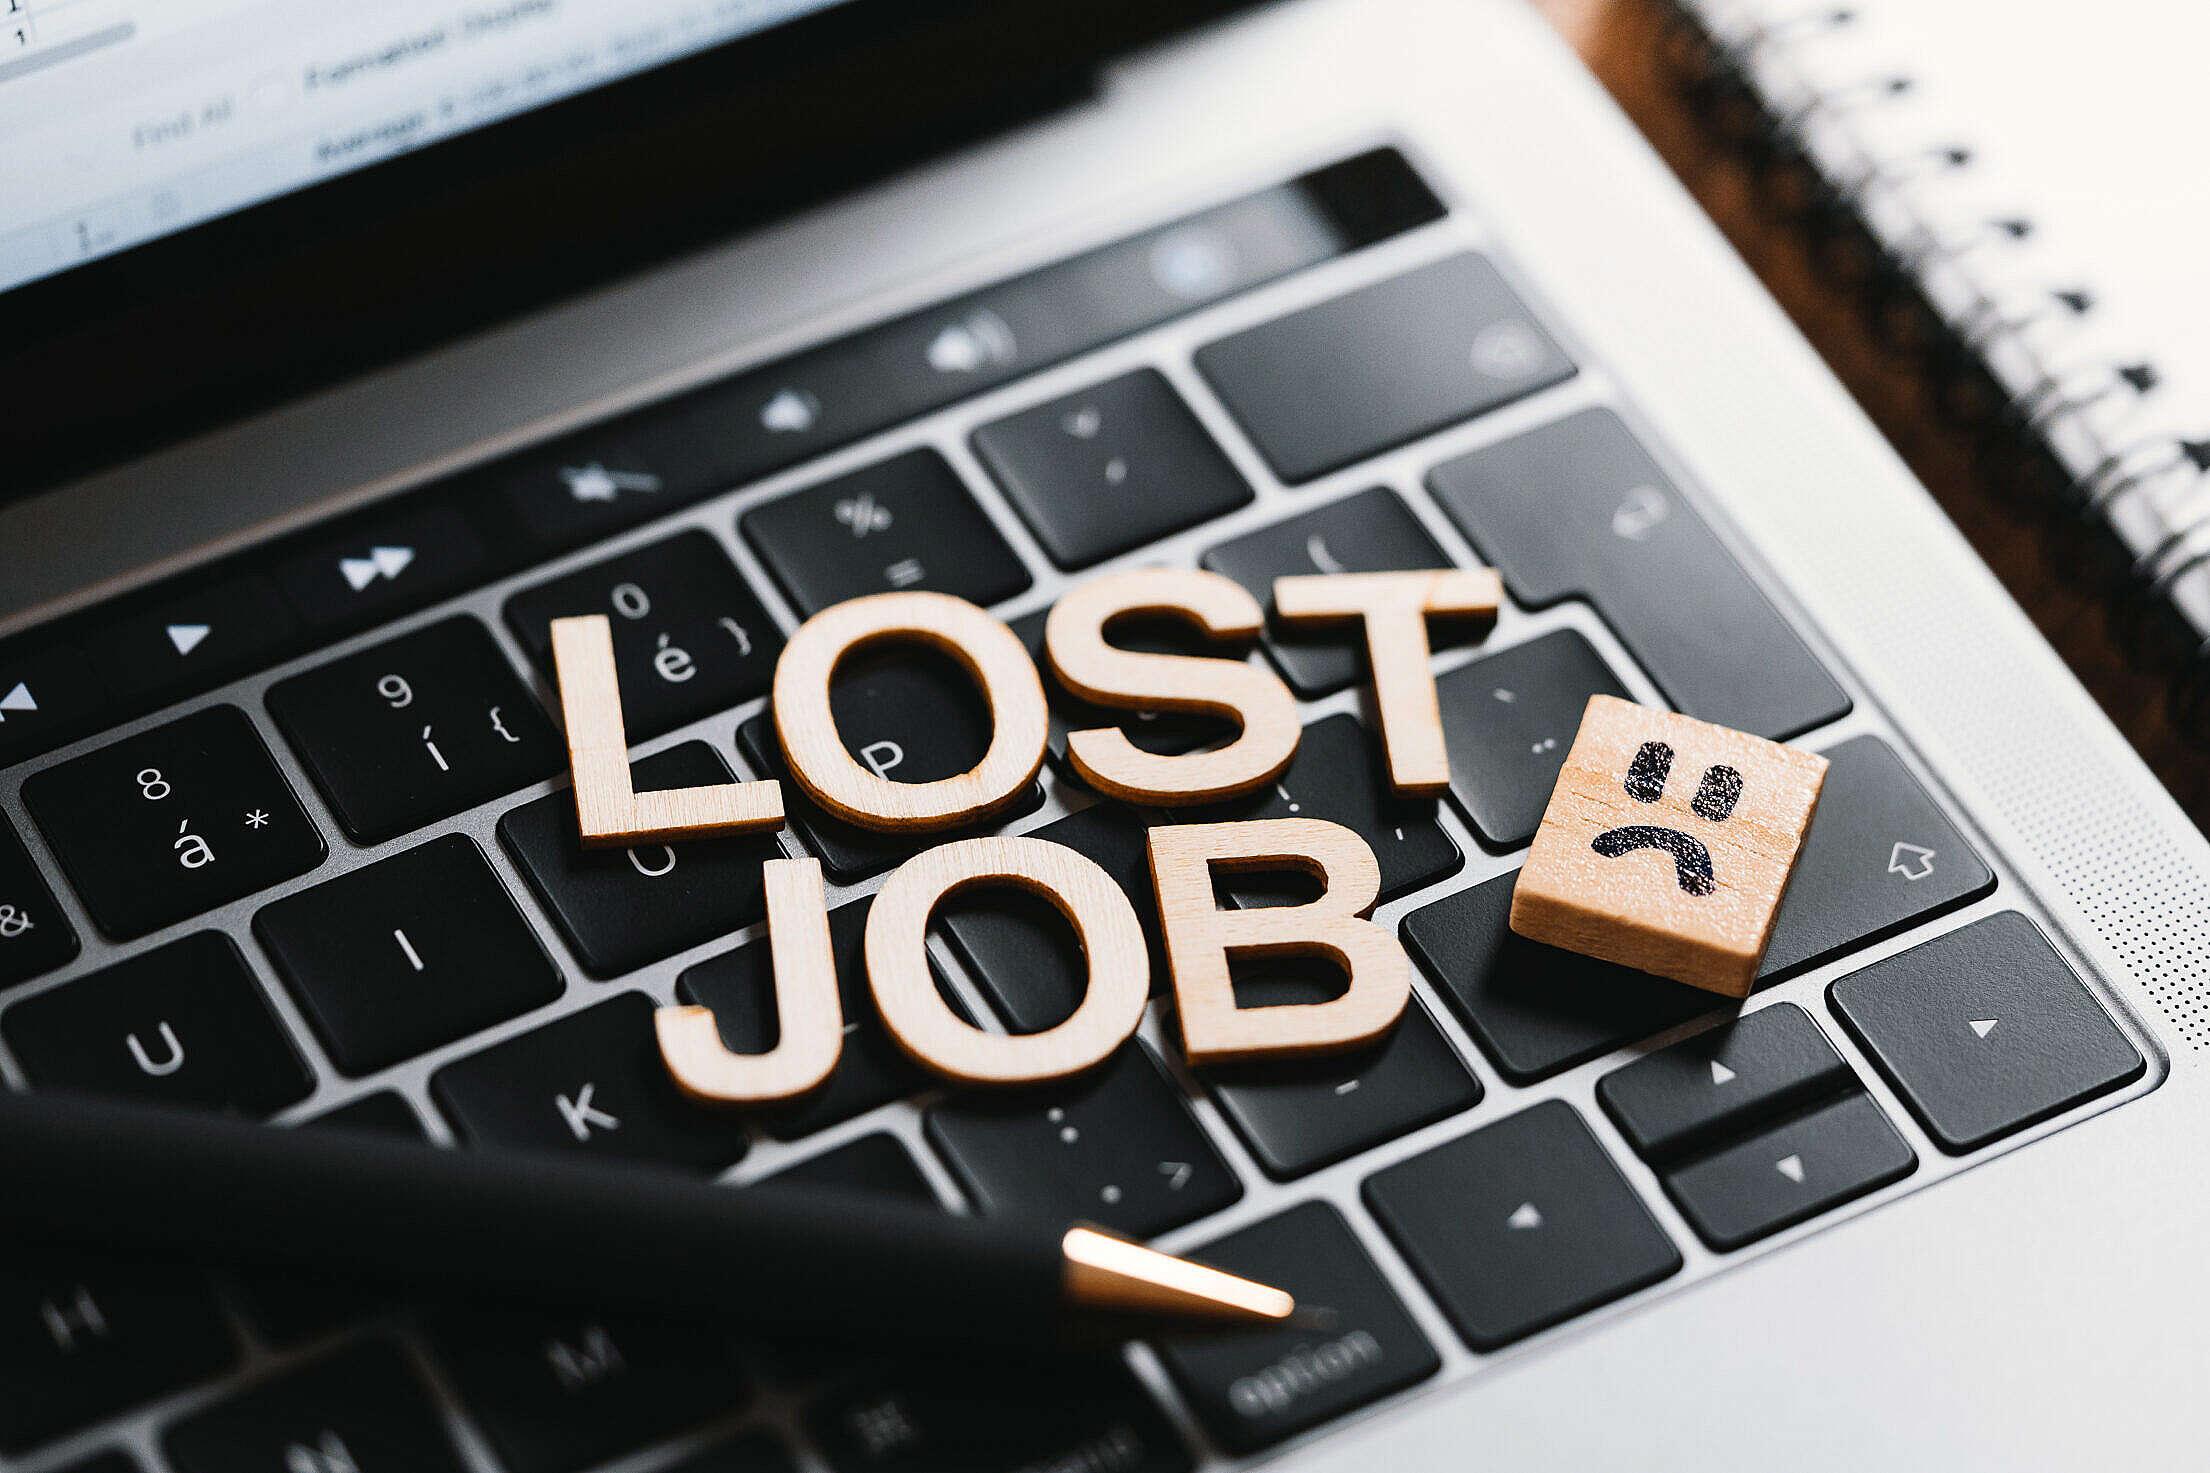 Lost Job Free Stock Photo